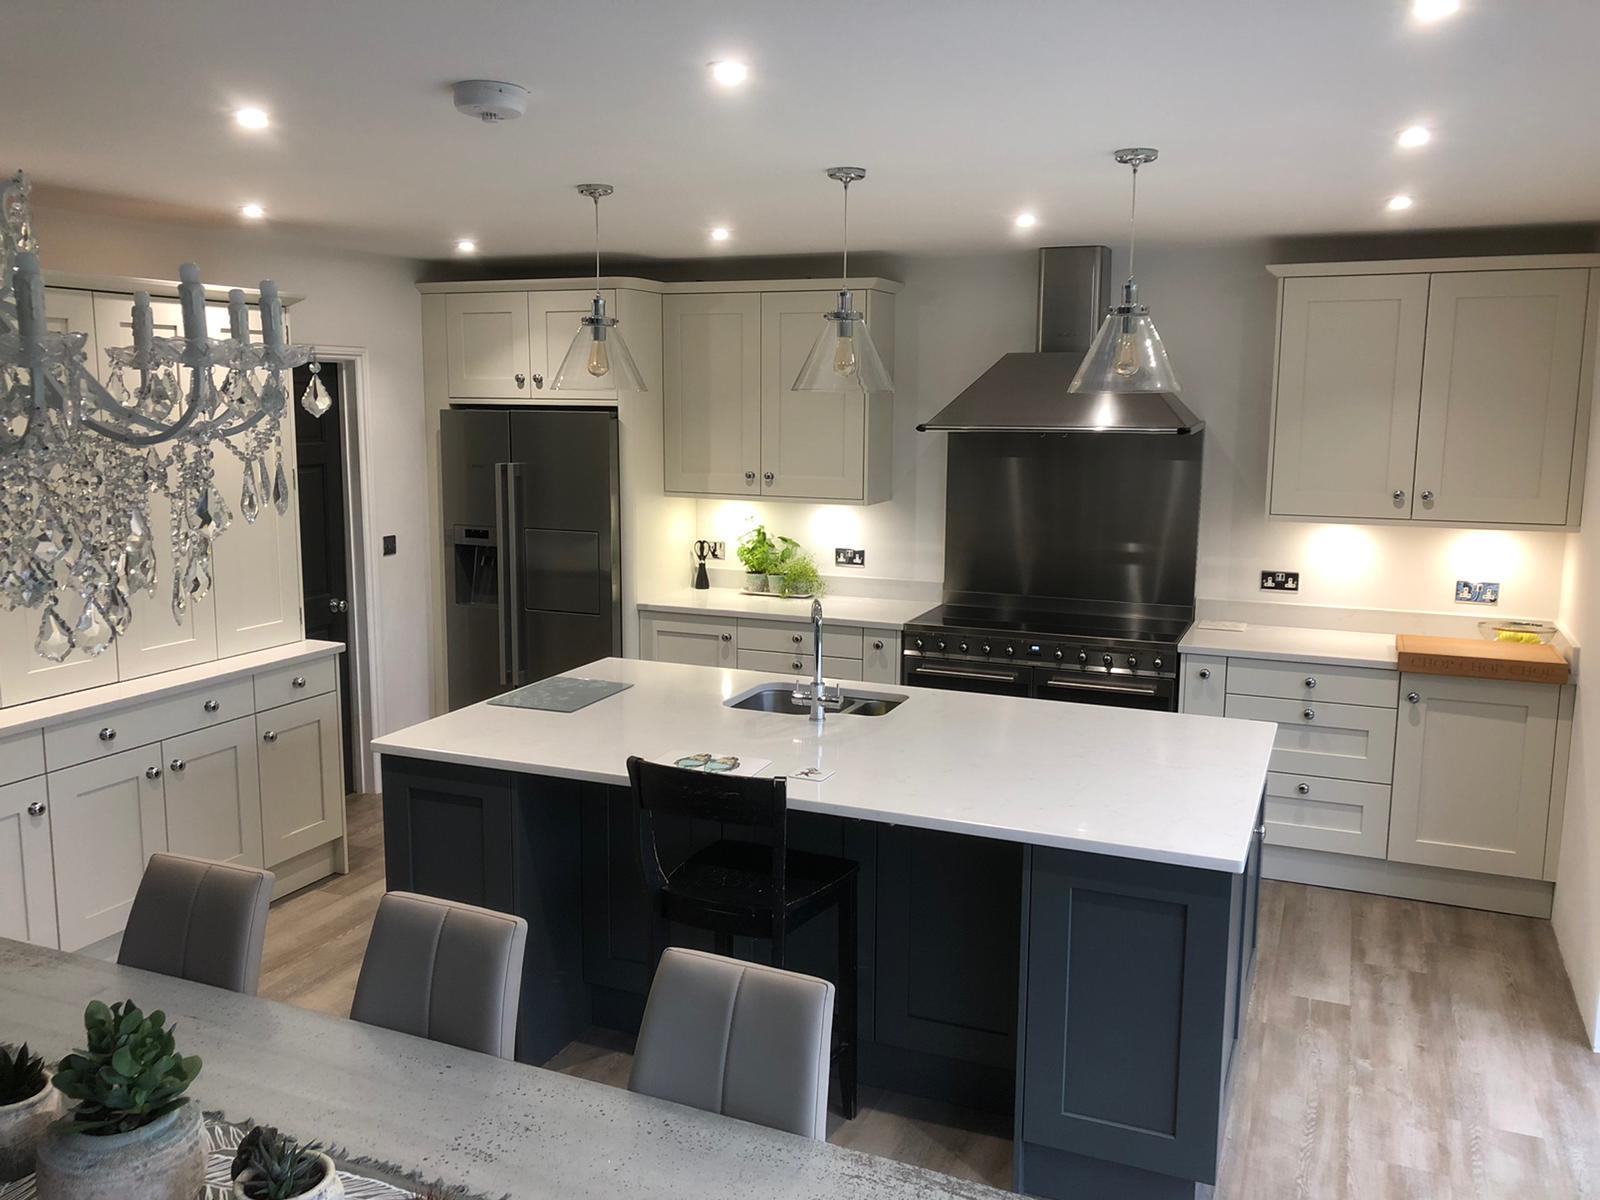 Northamptonshire - Kitchen